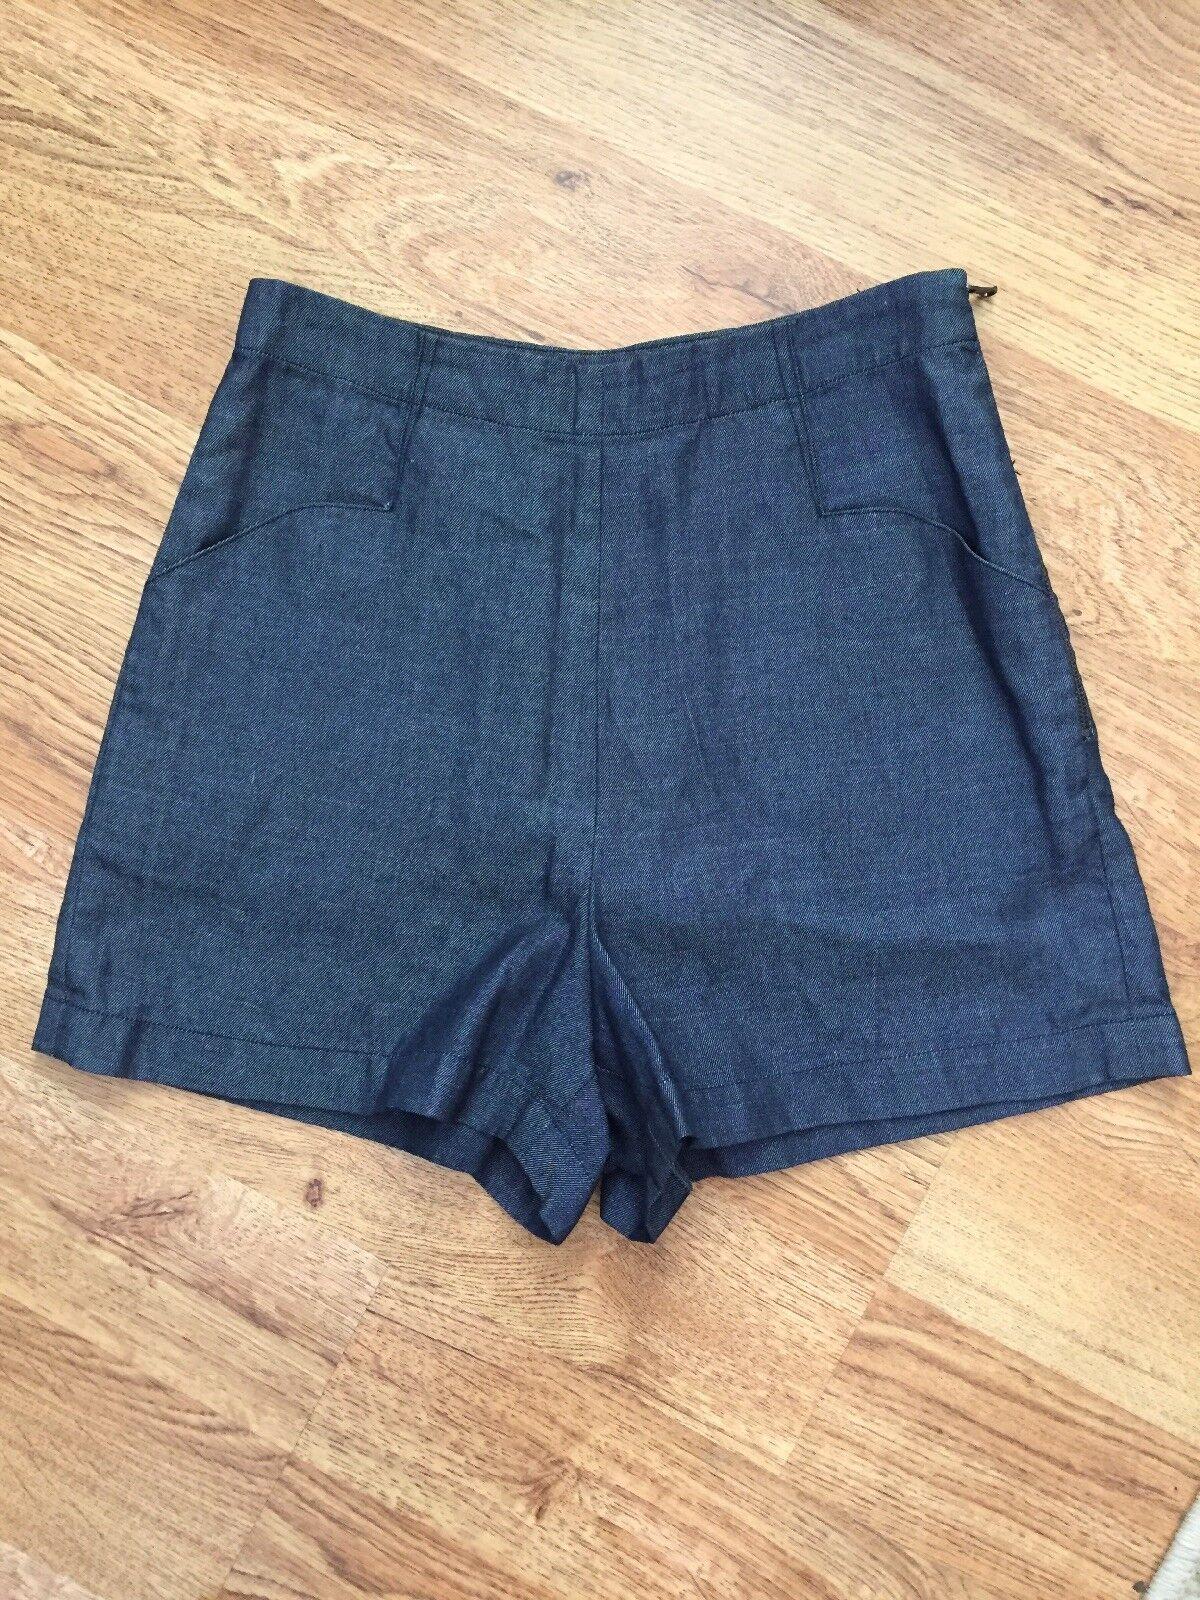 L'Agence NEW  100% Excel Dark Denim High Rise Short Shorts Sz 2 NWOT